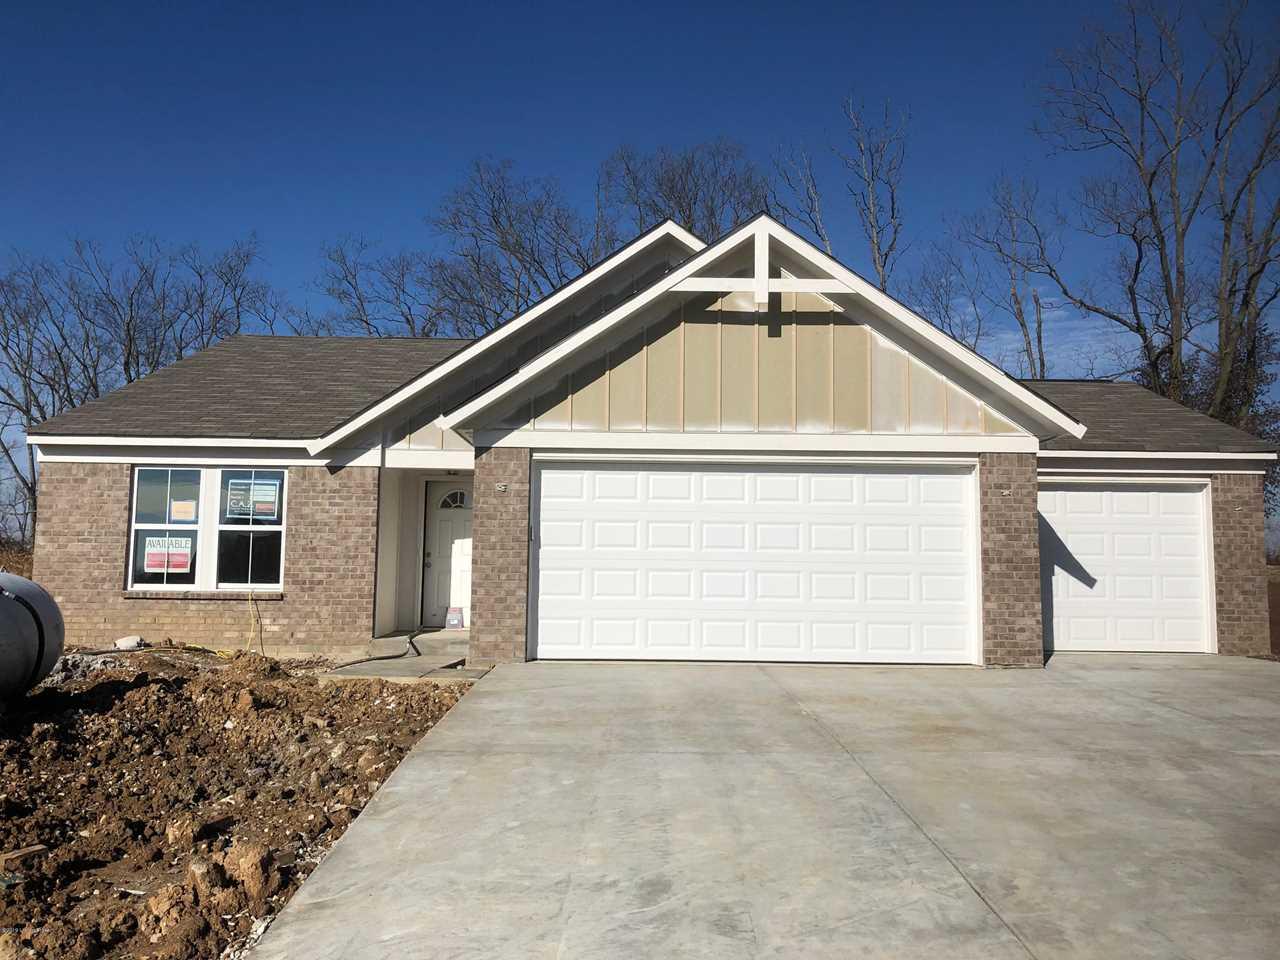 613 Birchwood Cir Shelbyville, KY 40065 | MLS 1508505 Photo 1